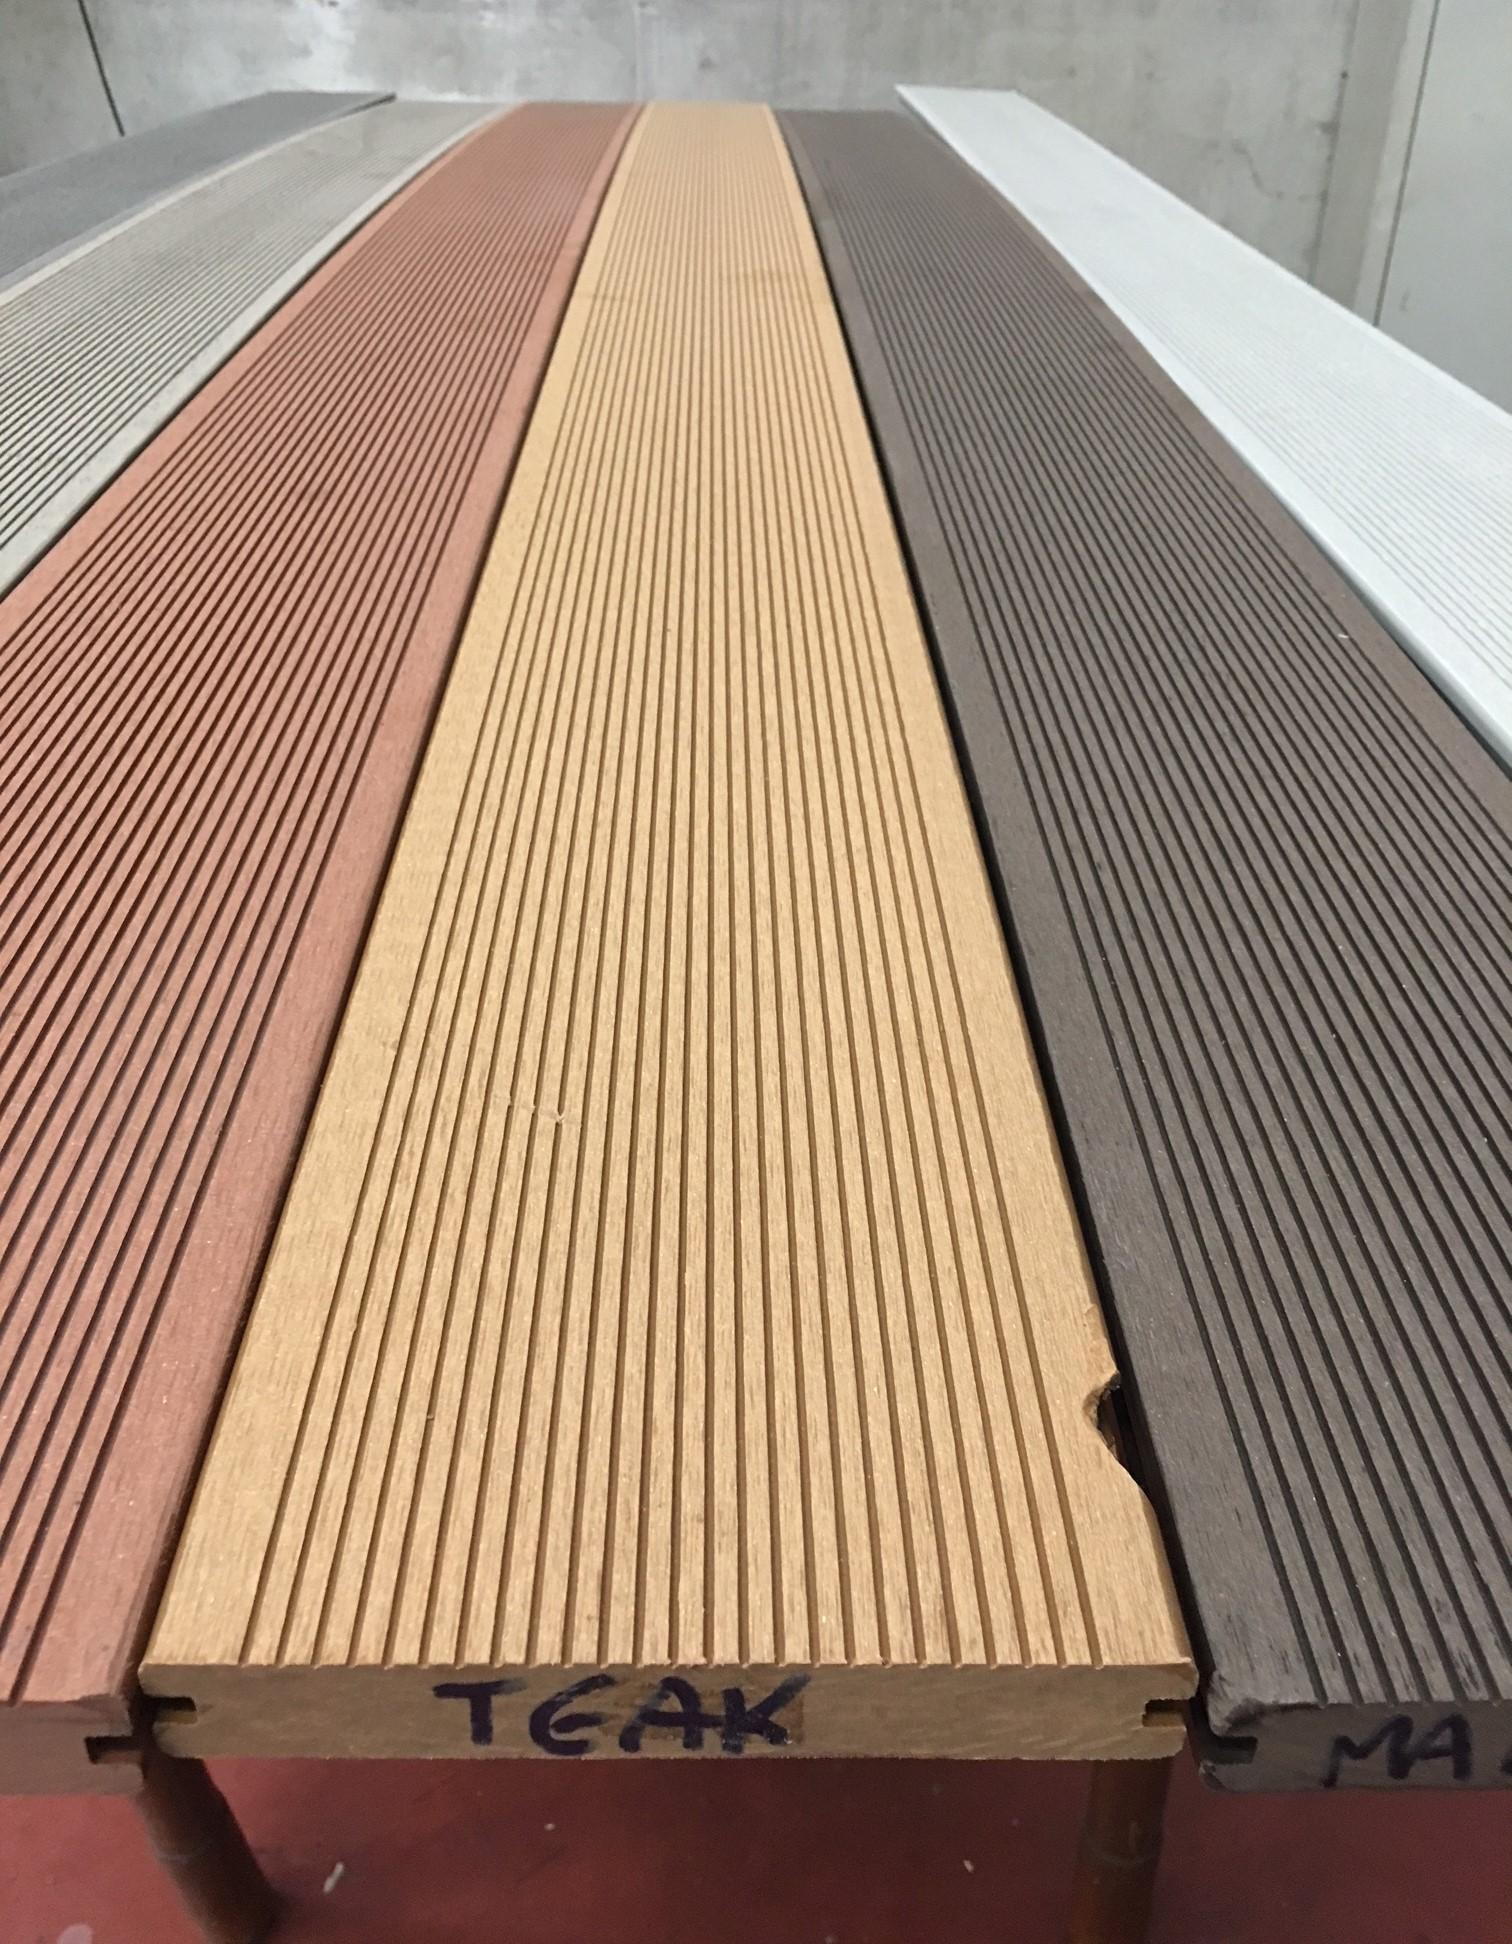 Pavimento per esterno Wpc Teak pieno 23 mm Bertolani Store